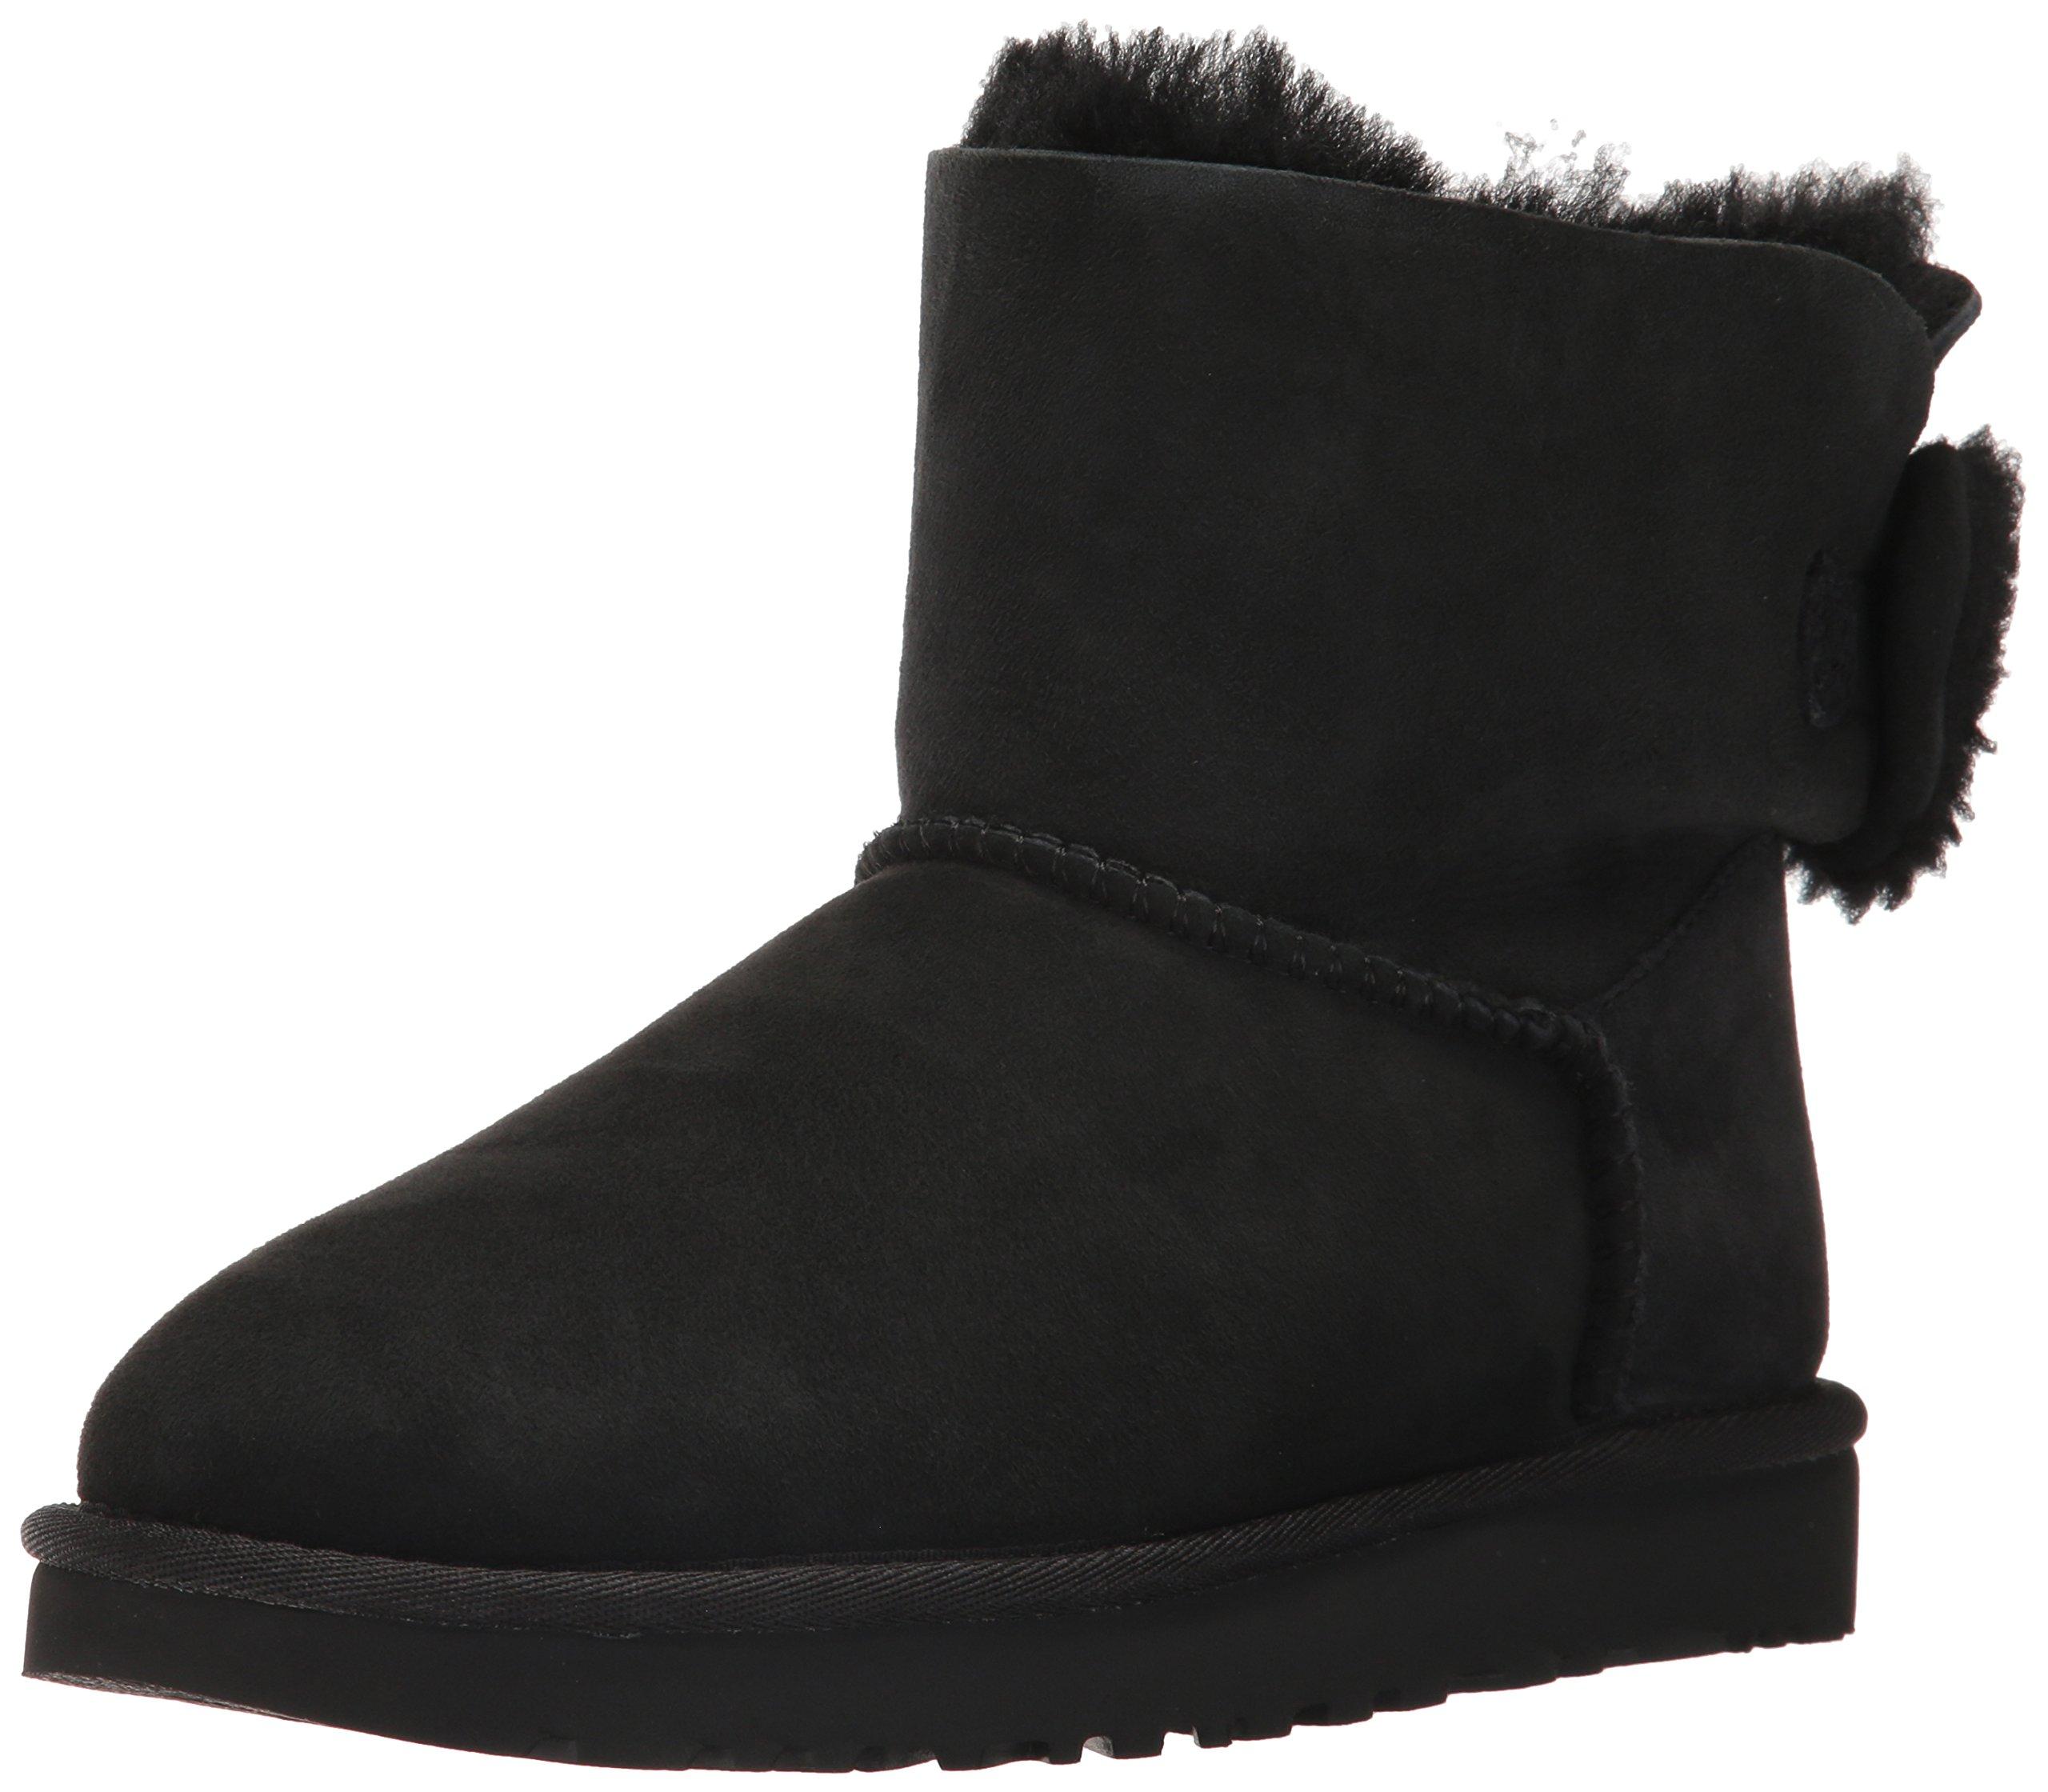 UGG Women's Arielle Winter Boot, Black, 6 M US